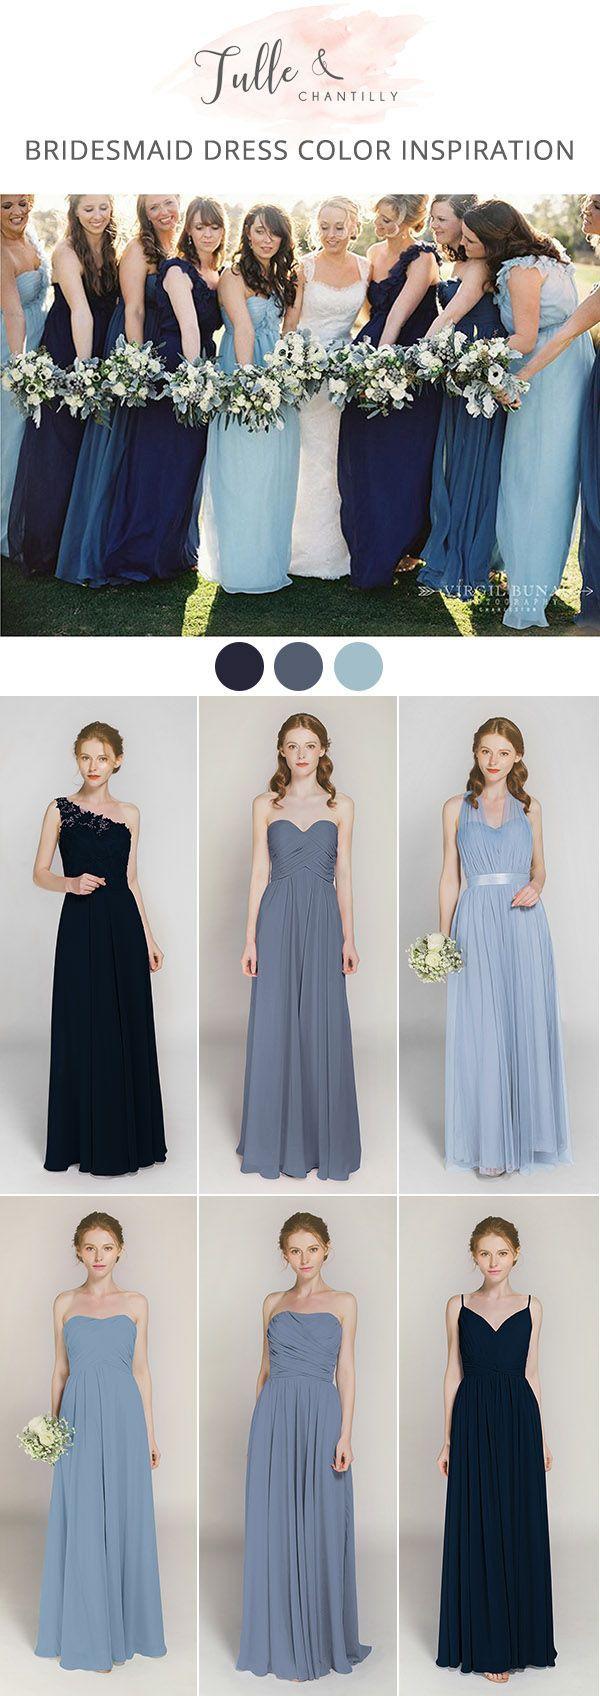 1169 best bridesmaid dresses images on pinterest party fashion blue bridesmaid dresses junior bridesmaid dress ombrellifo Choice Image